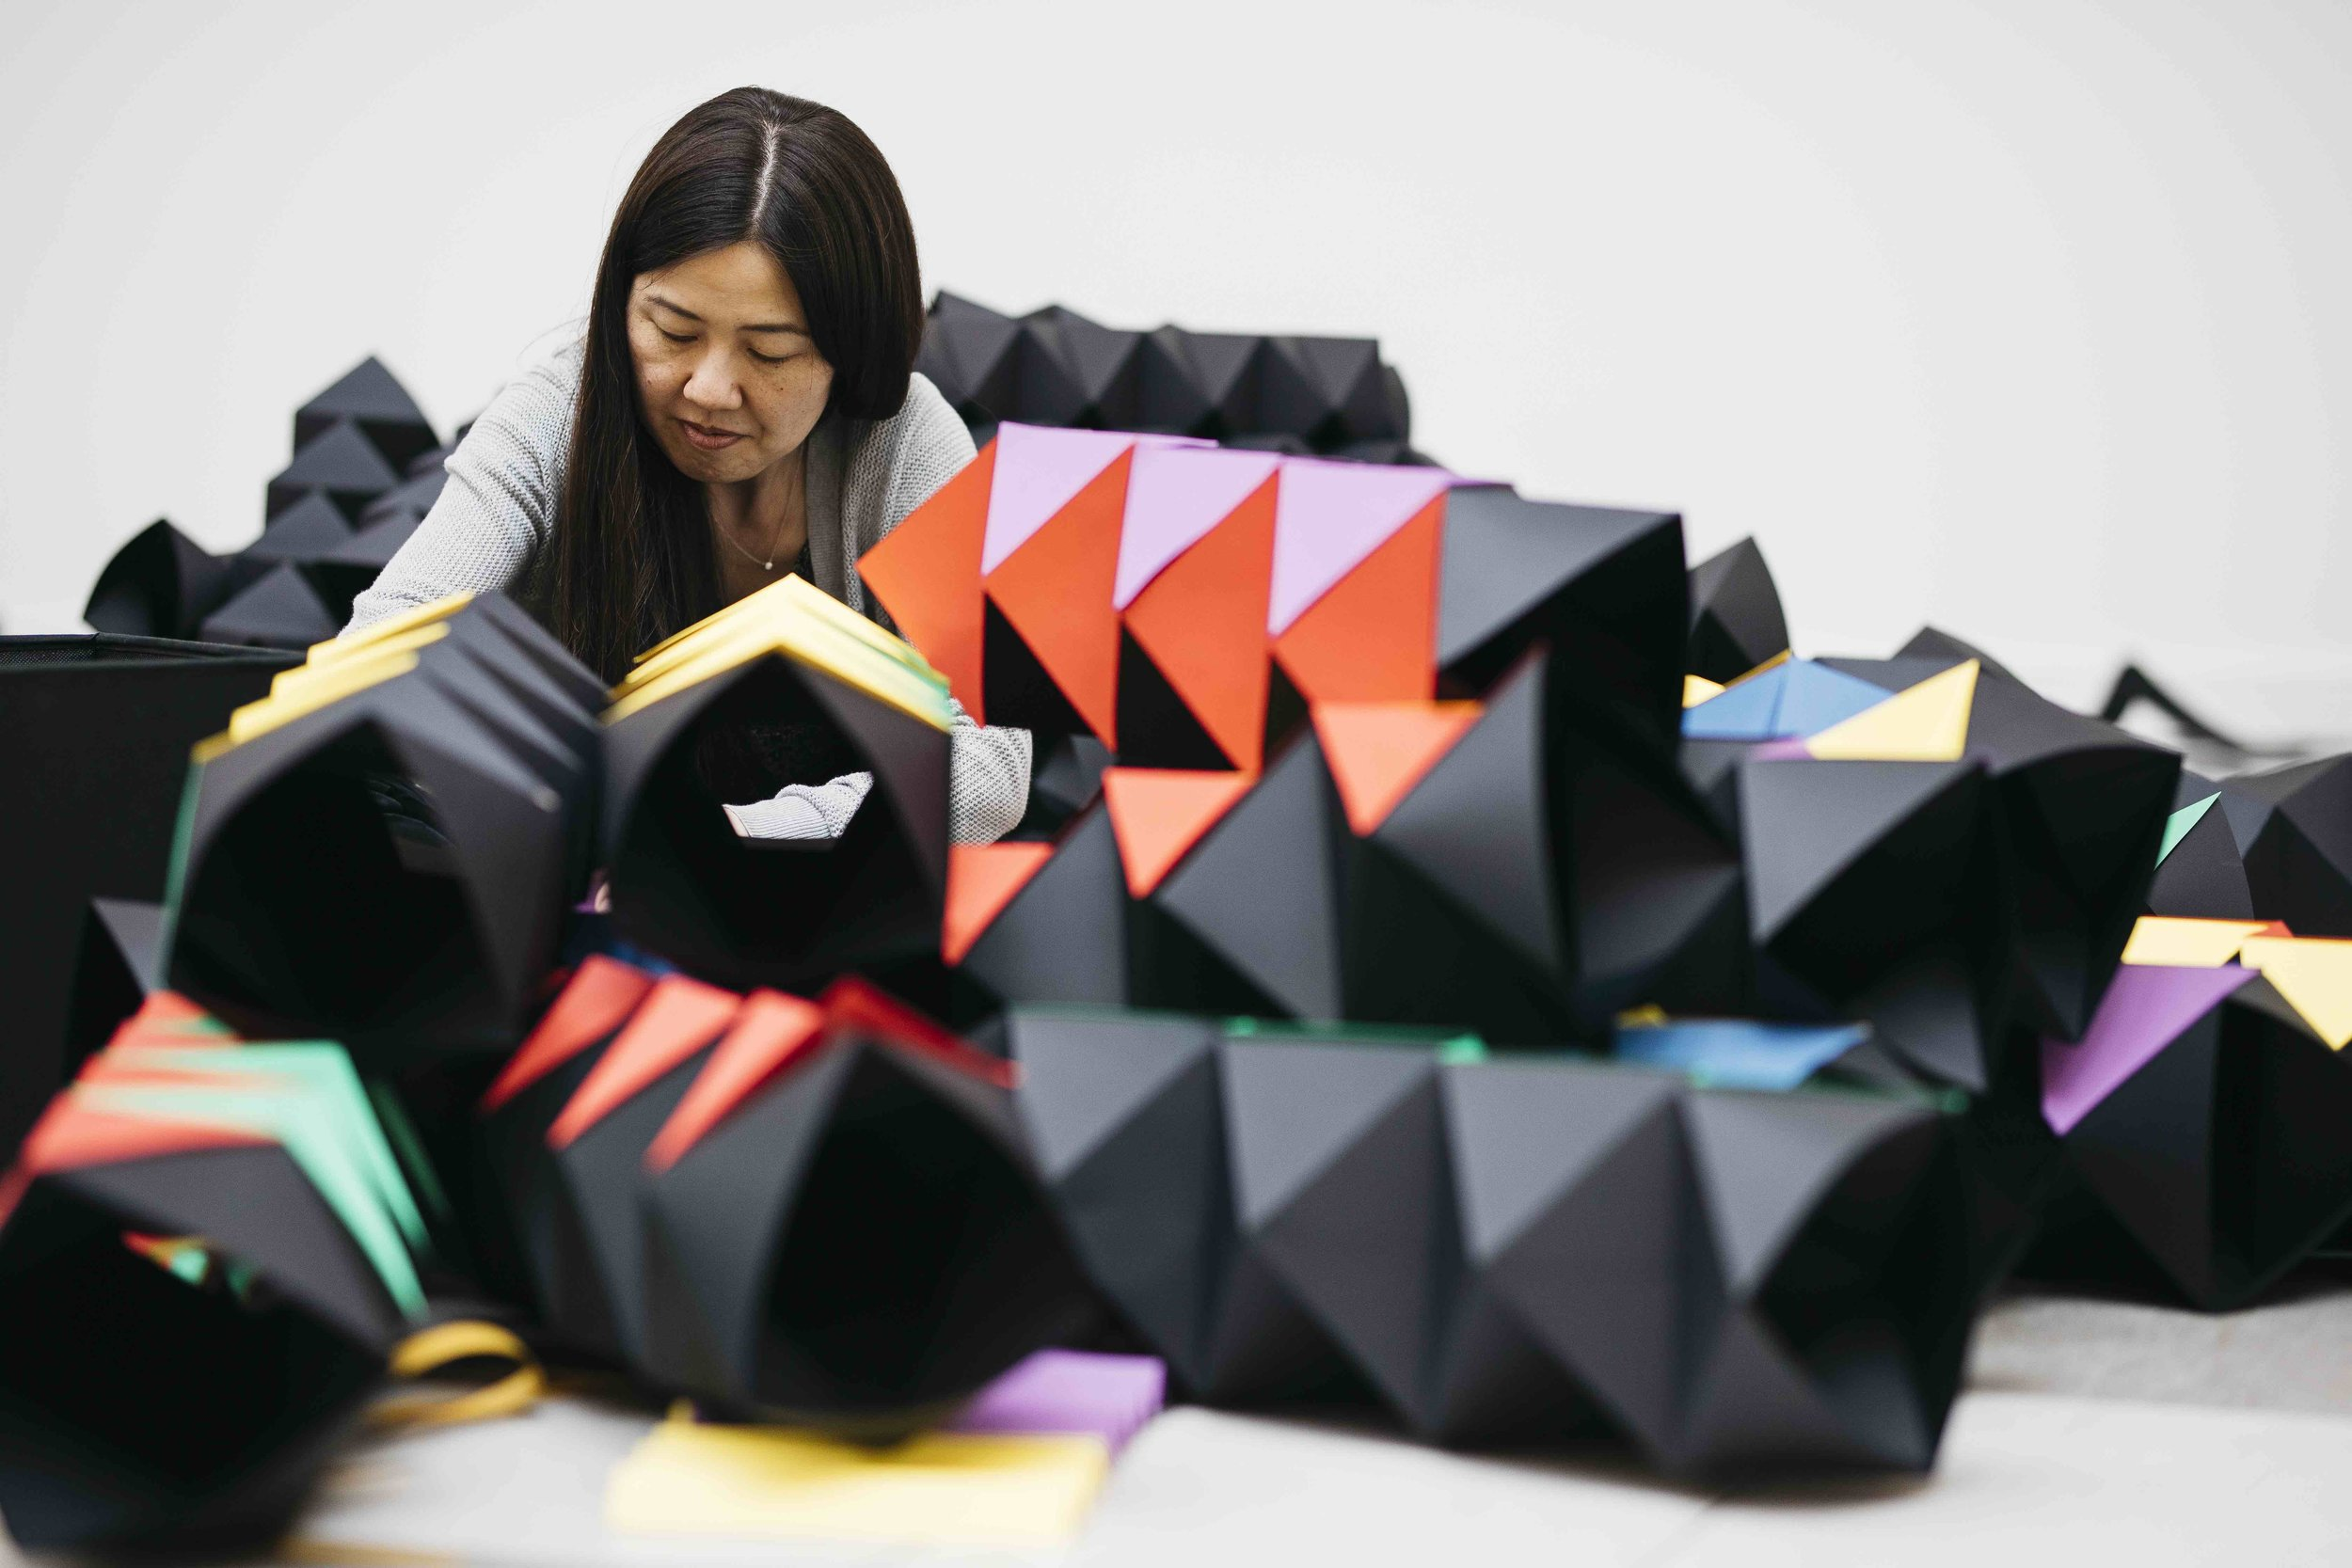 miss cloudy pauline loctin ancestrale paper art installation origami mural wall 1.jpg